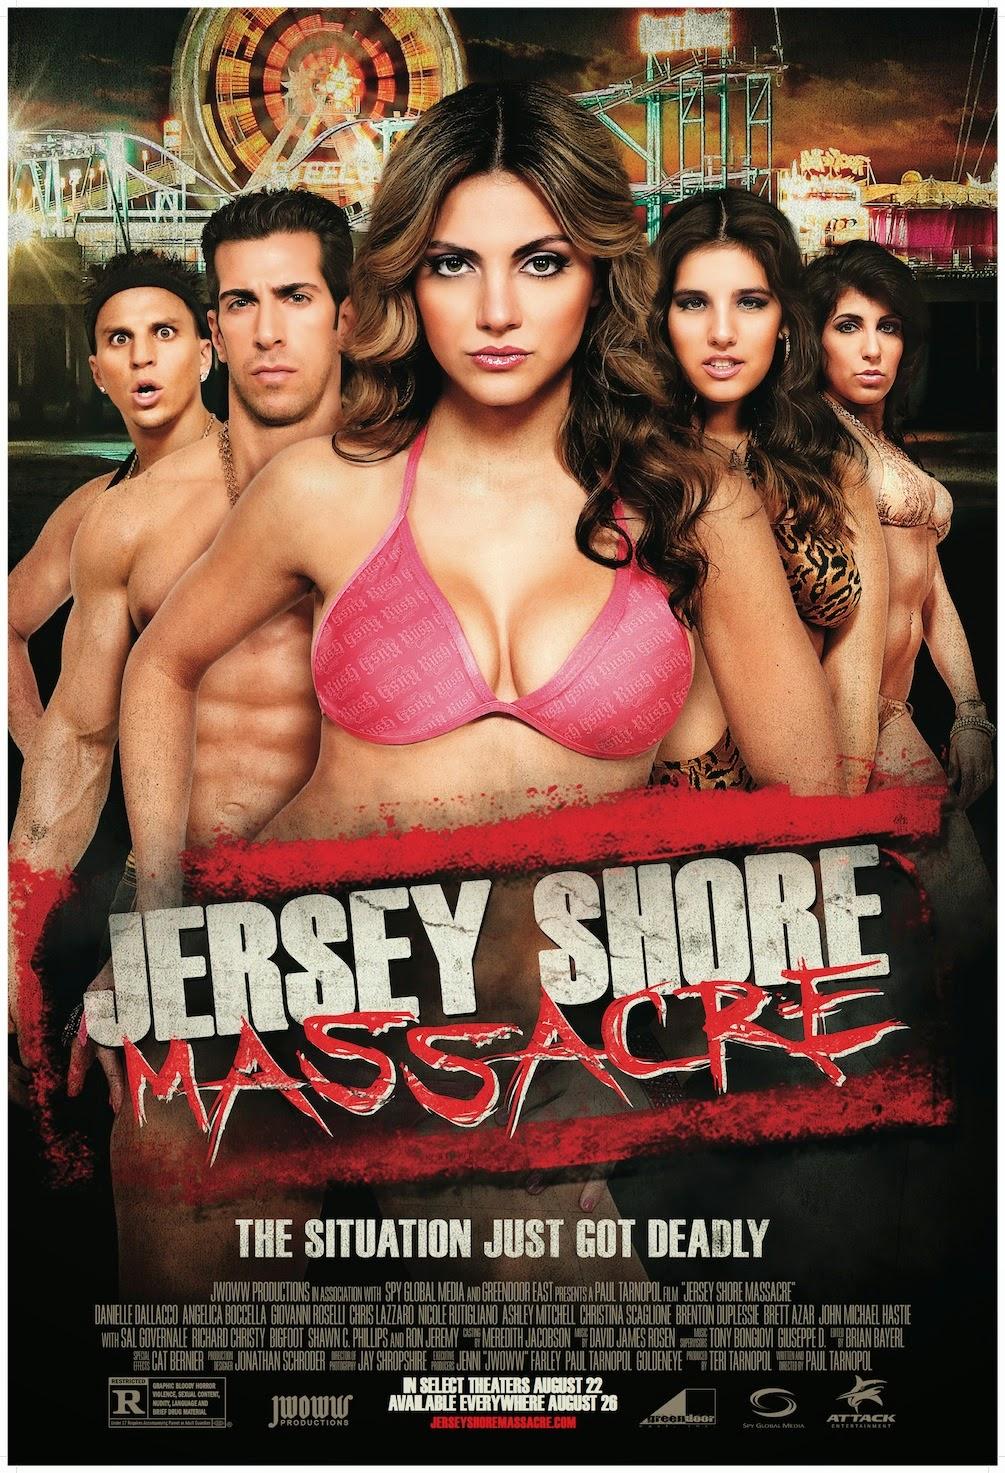 Jersey Shore Massacre (2014) Brrip ταινιες online seires oipeirates greek subs